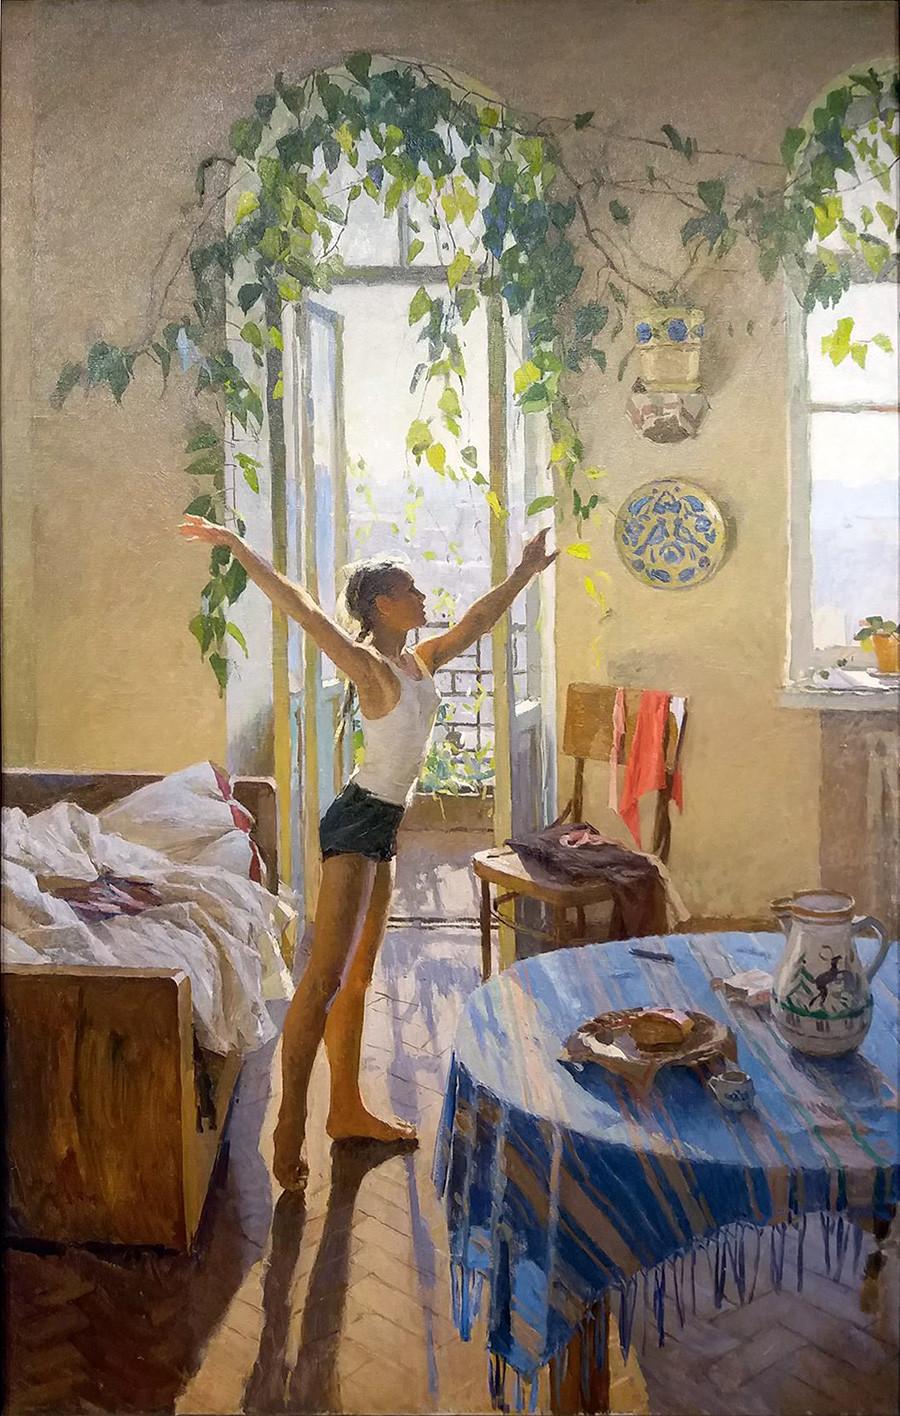 Le matin par Tatiana Iablonskaïa, 1954